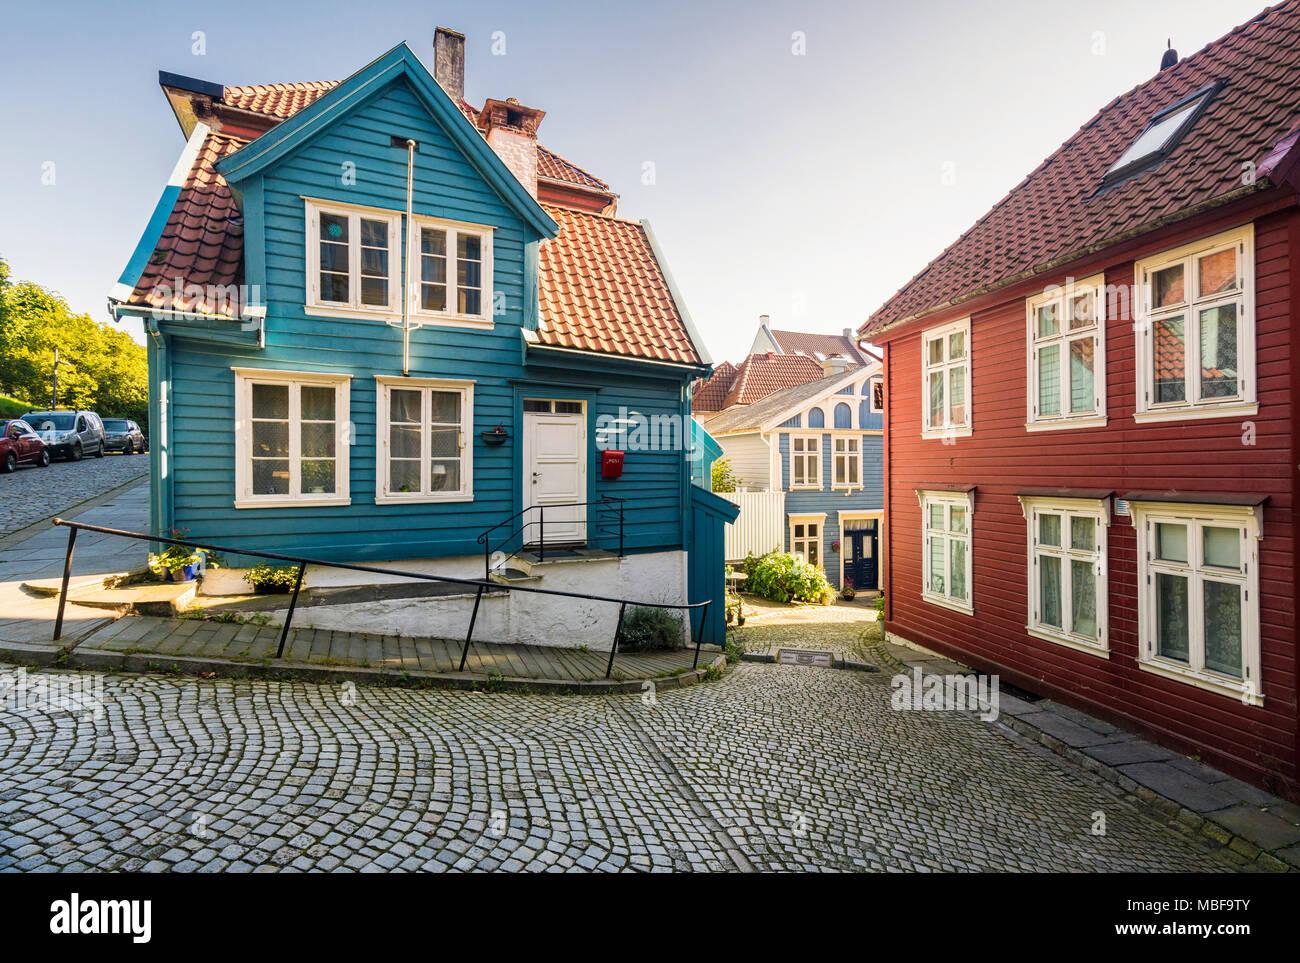 Bergen, Norwegen, die Altstadt mit bemalten Holzhäuser Stockbild